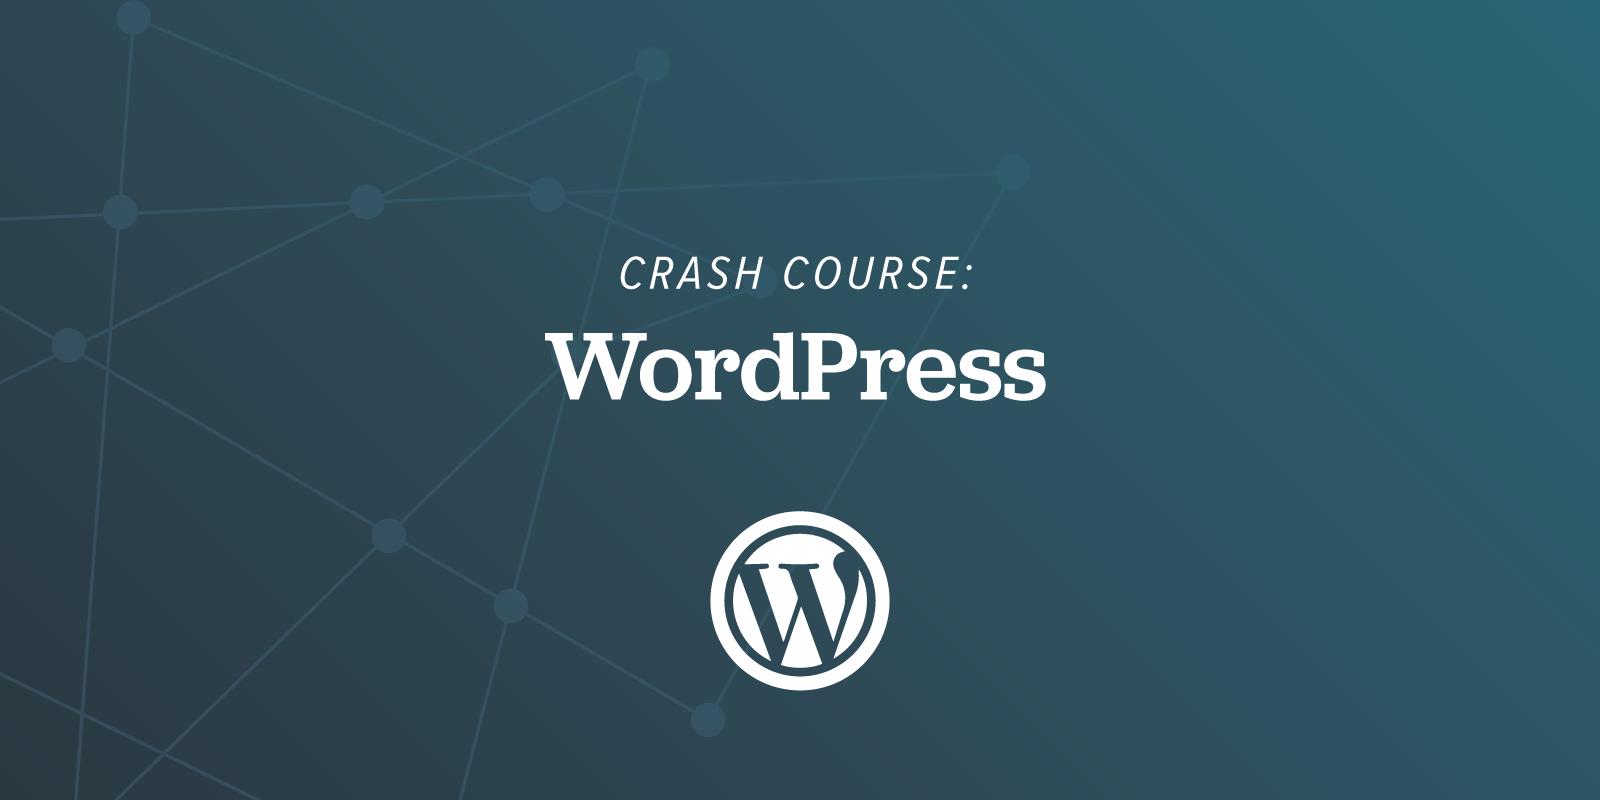 Crash Course: WordPress